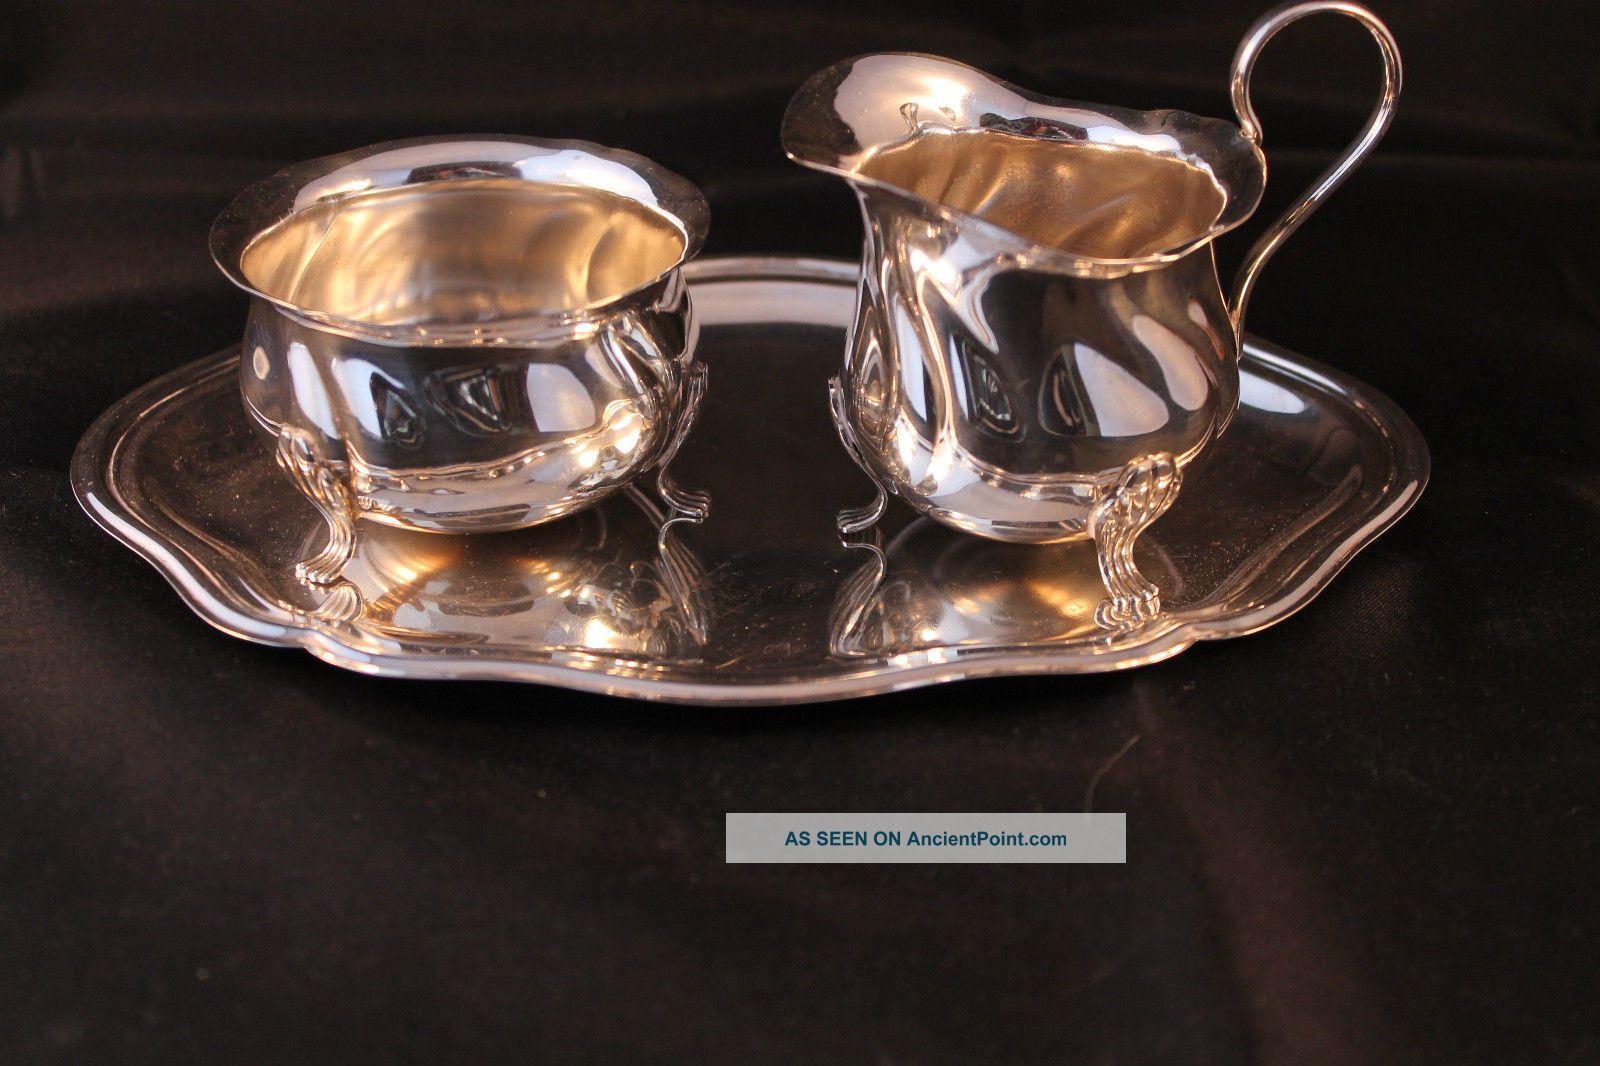 Retro Vintage Silver Plate Milk Jug & Sugar Bowl On A Tray Art Deco In Style Sugar Bowls/Tongs photo